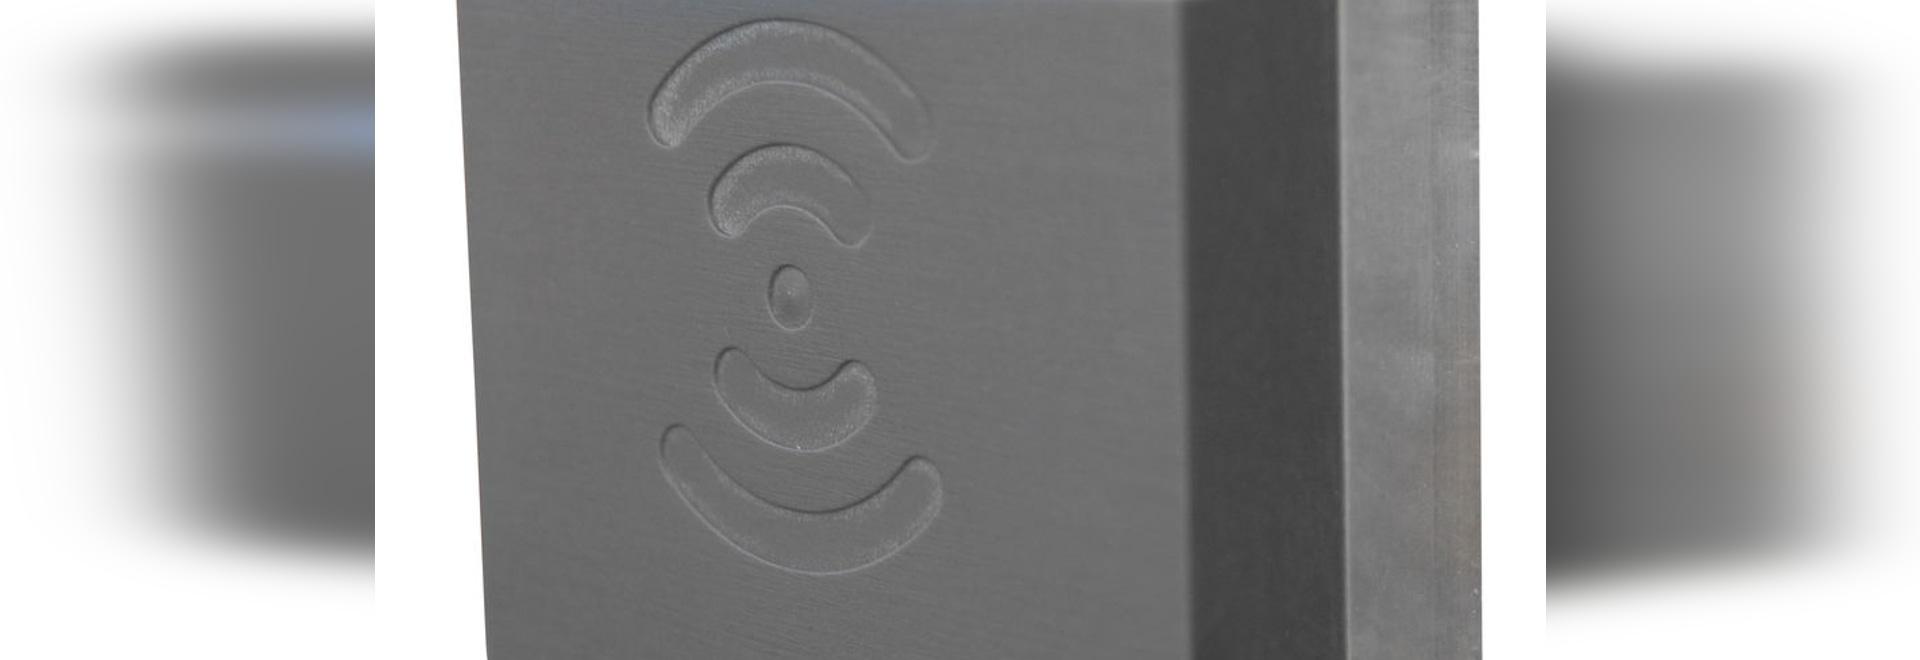 NEW: proximity card reader by Alphatronics